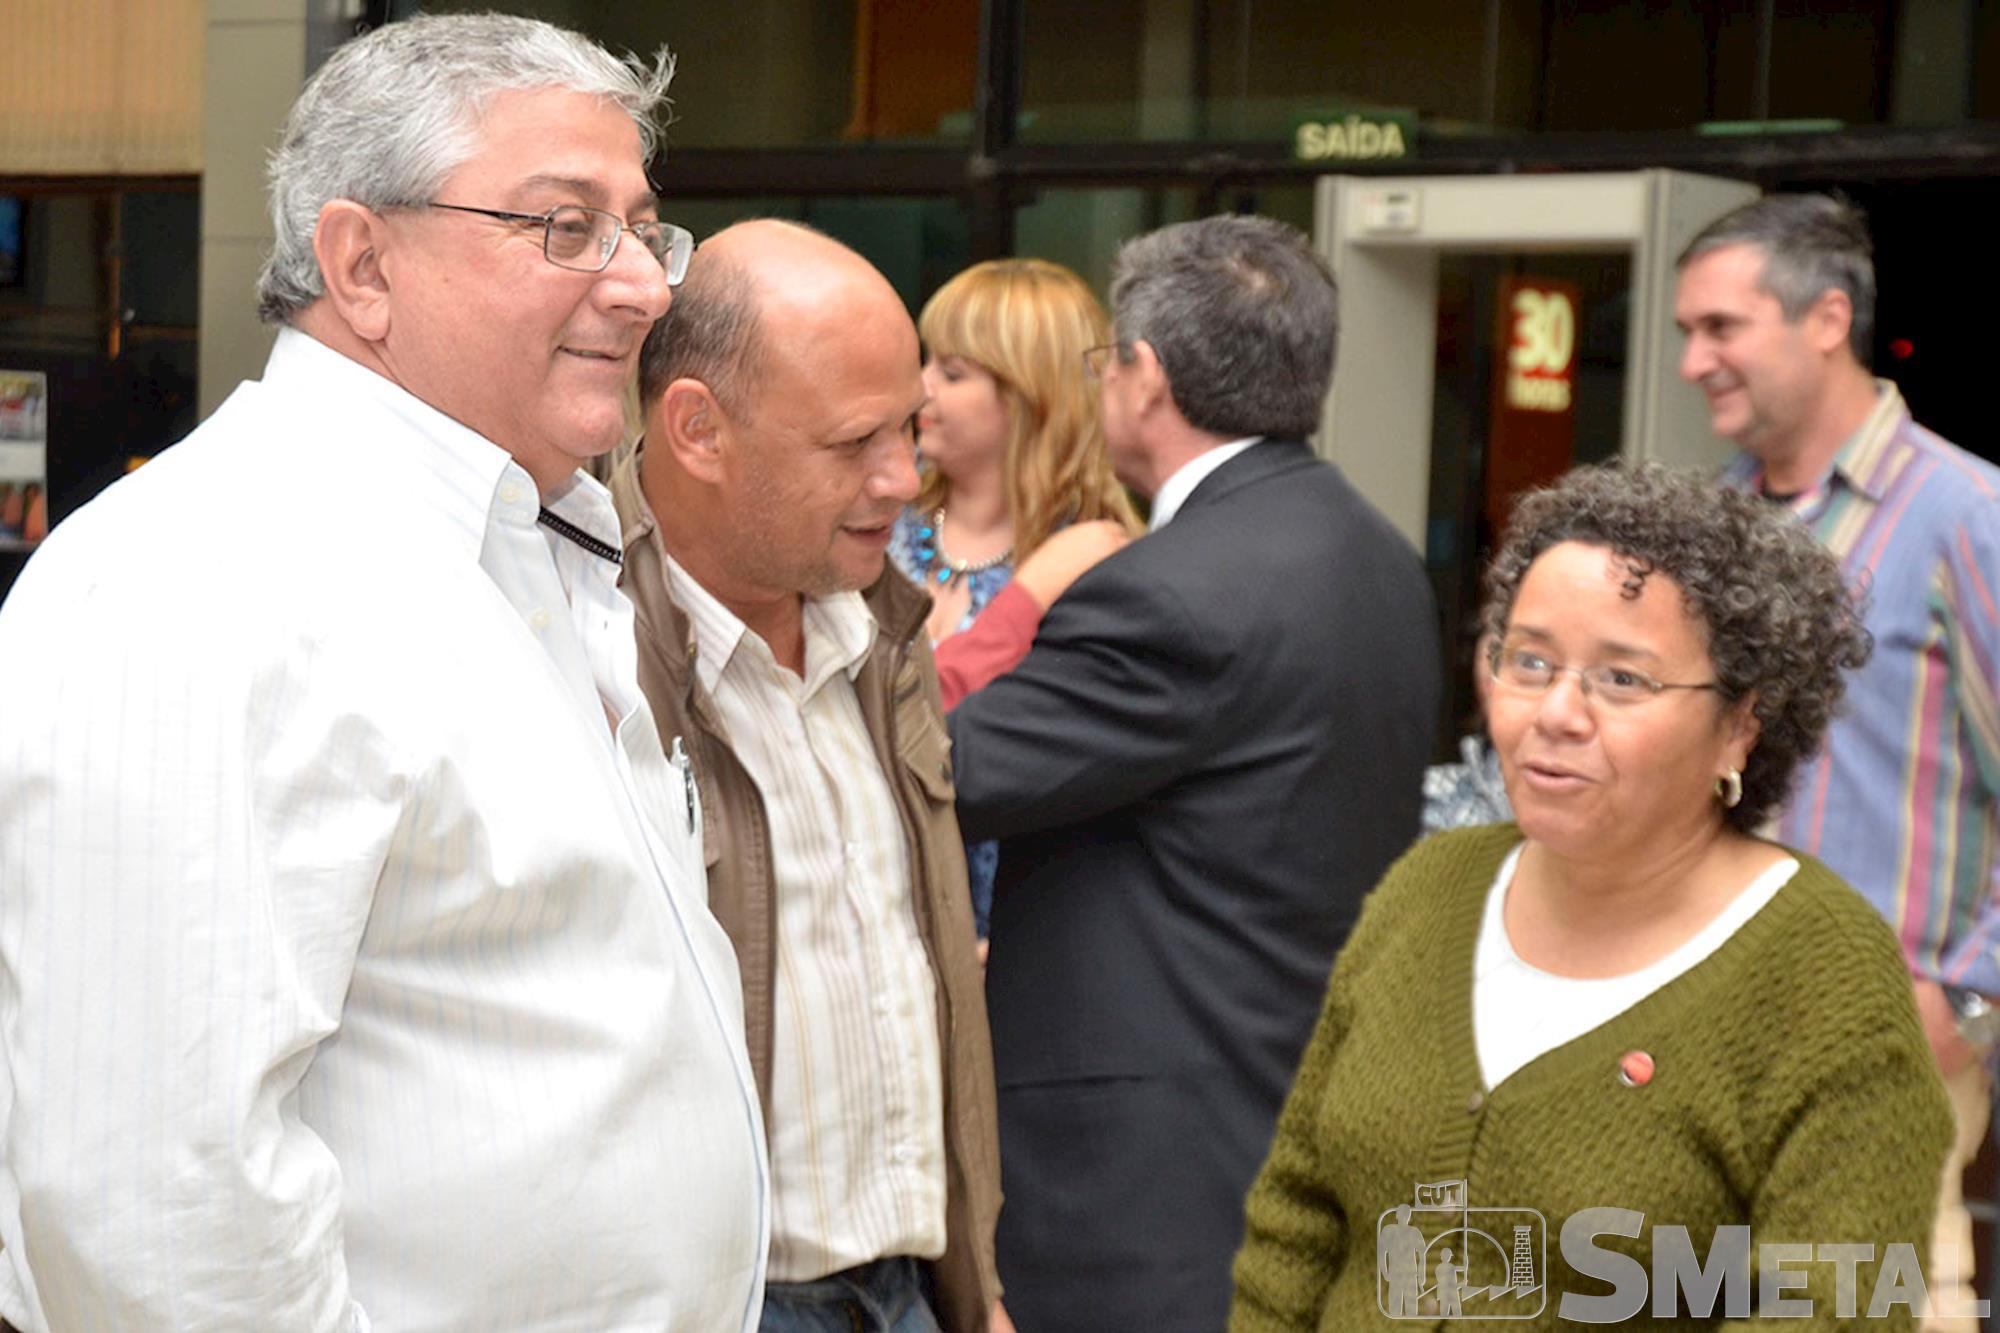 Ex-presidente do Sindicato dos Metalúrgicos,  Carlos Roberto de Gáspari; o atual presidente,  Ademilson Terto da Silva,  e Lúcia Gonçalves,  da subsede da, Sessão Solene na Câmara de Sorocaba comemora 30 anos de CUT